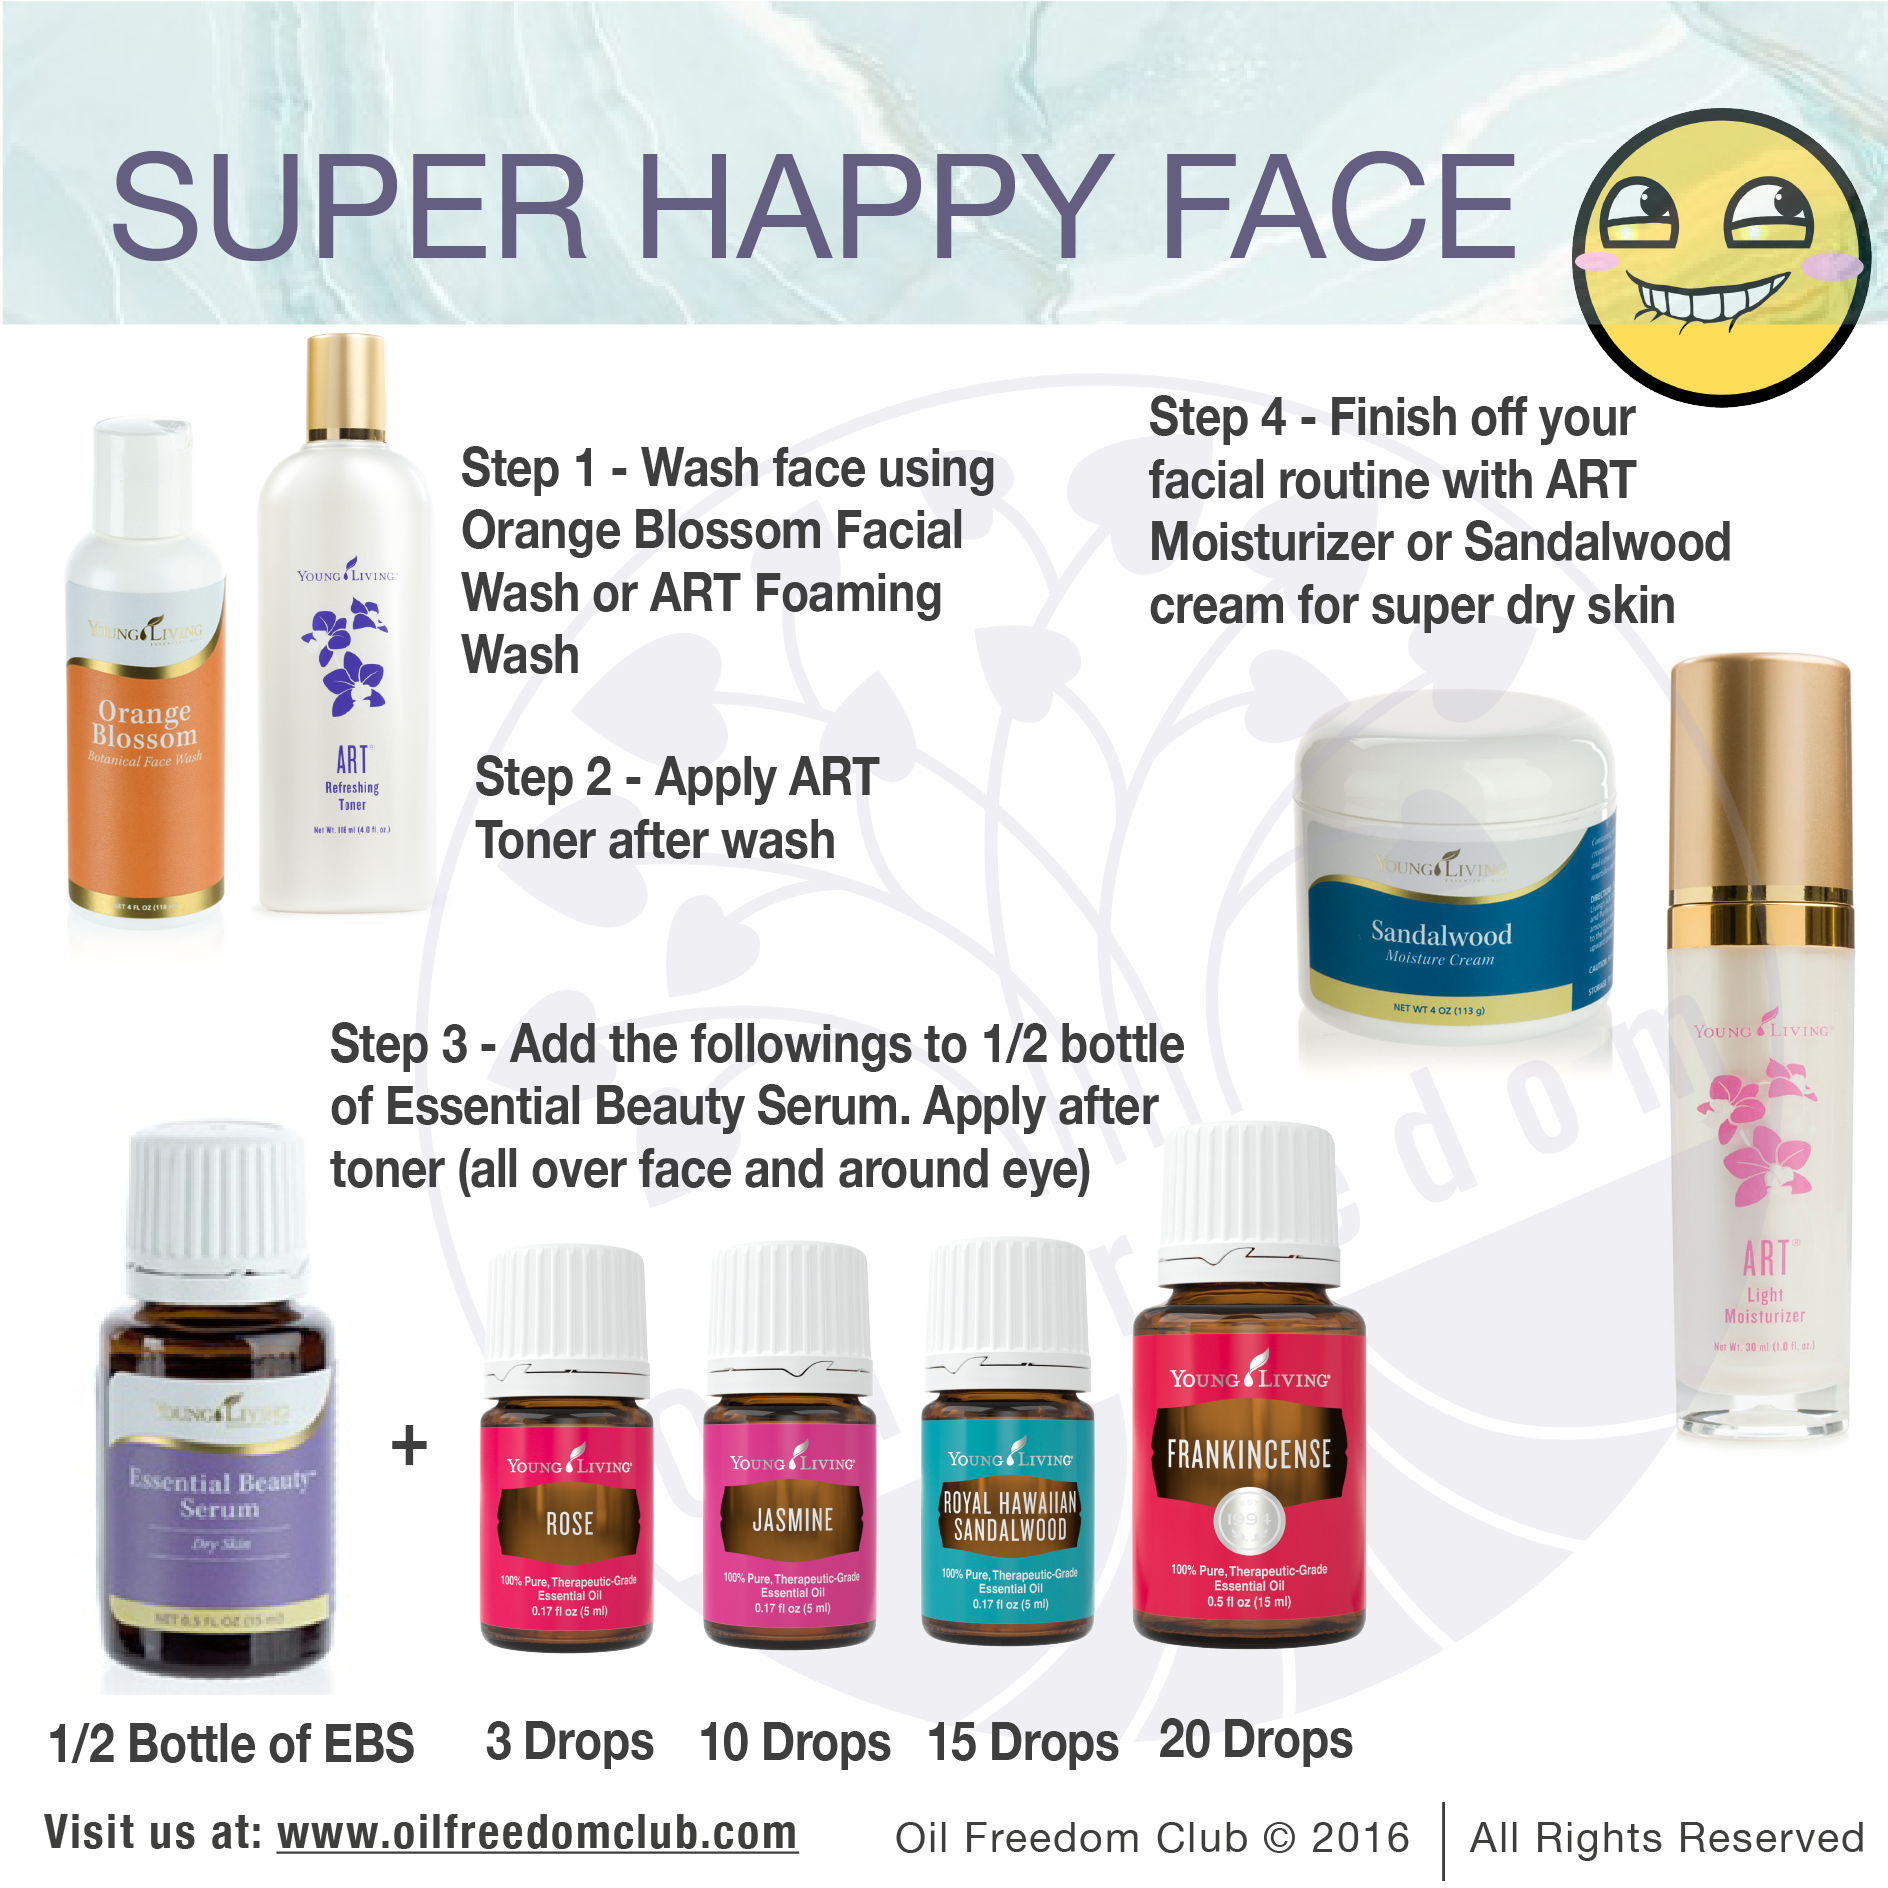 Super Happy Face